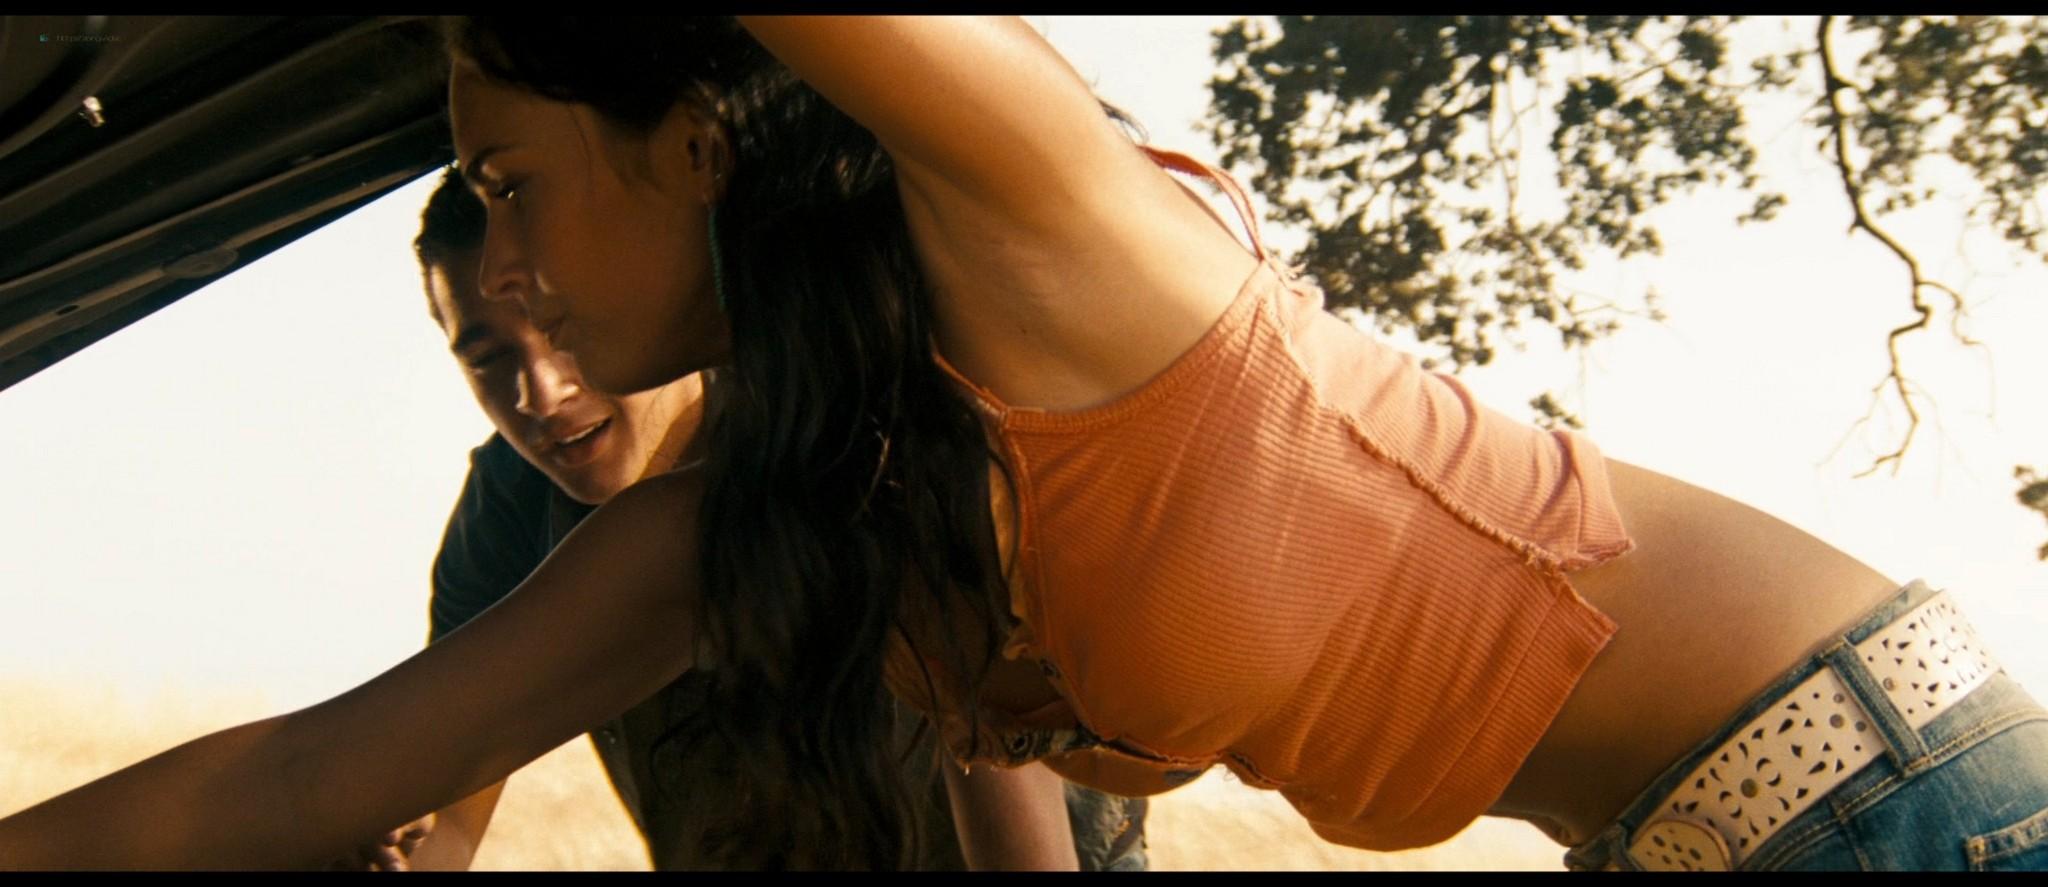 Megan Fox hot and sexy - Transformers (2007) HD 1080p BluRay Remux (12)